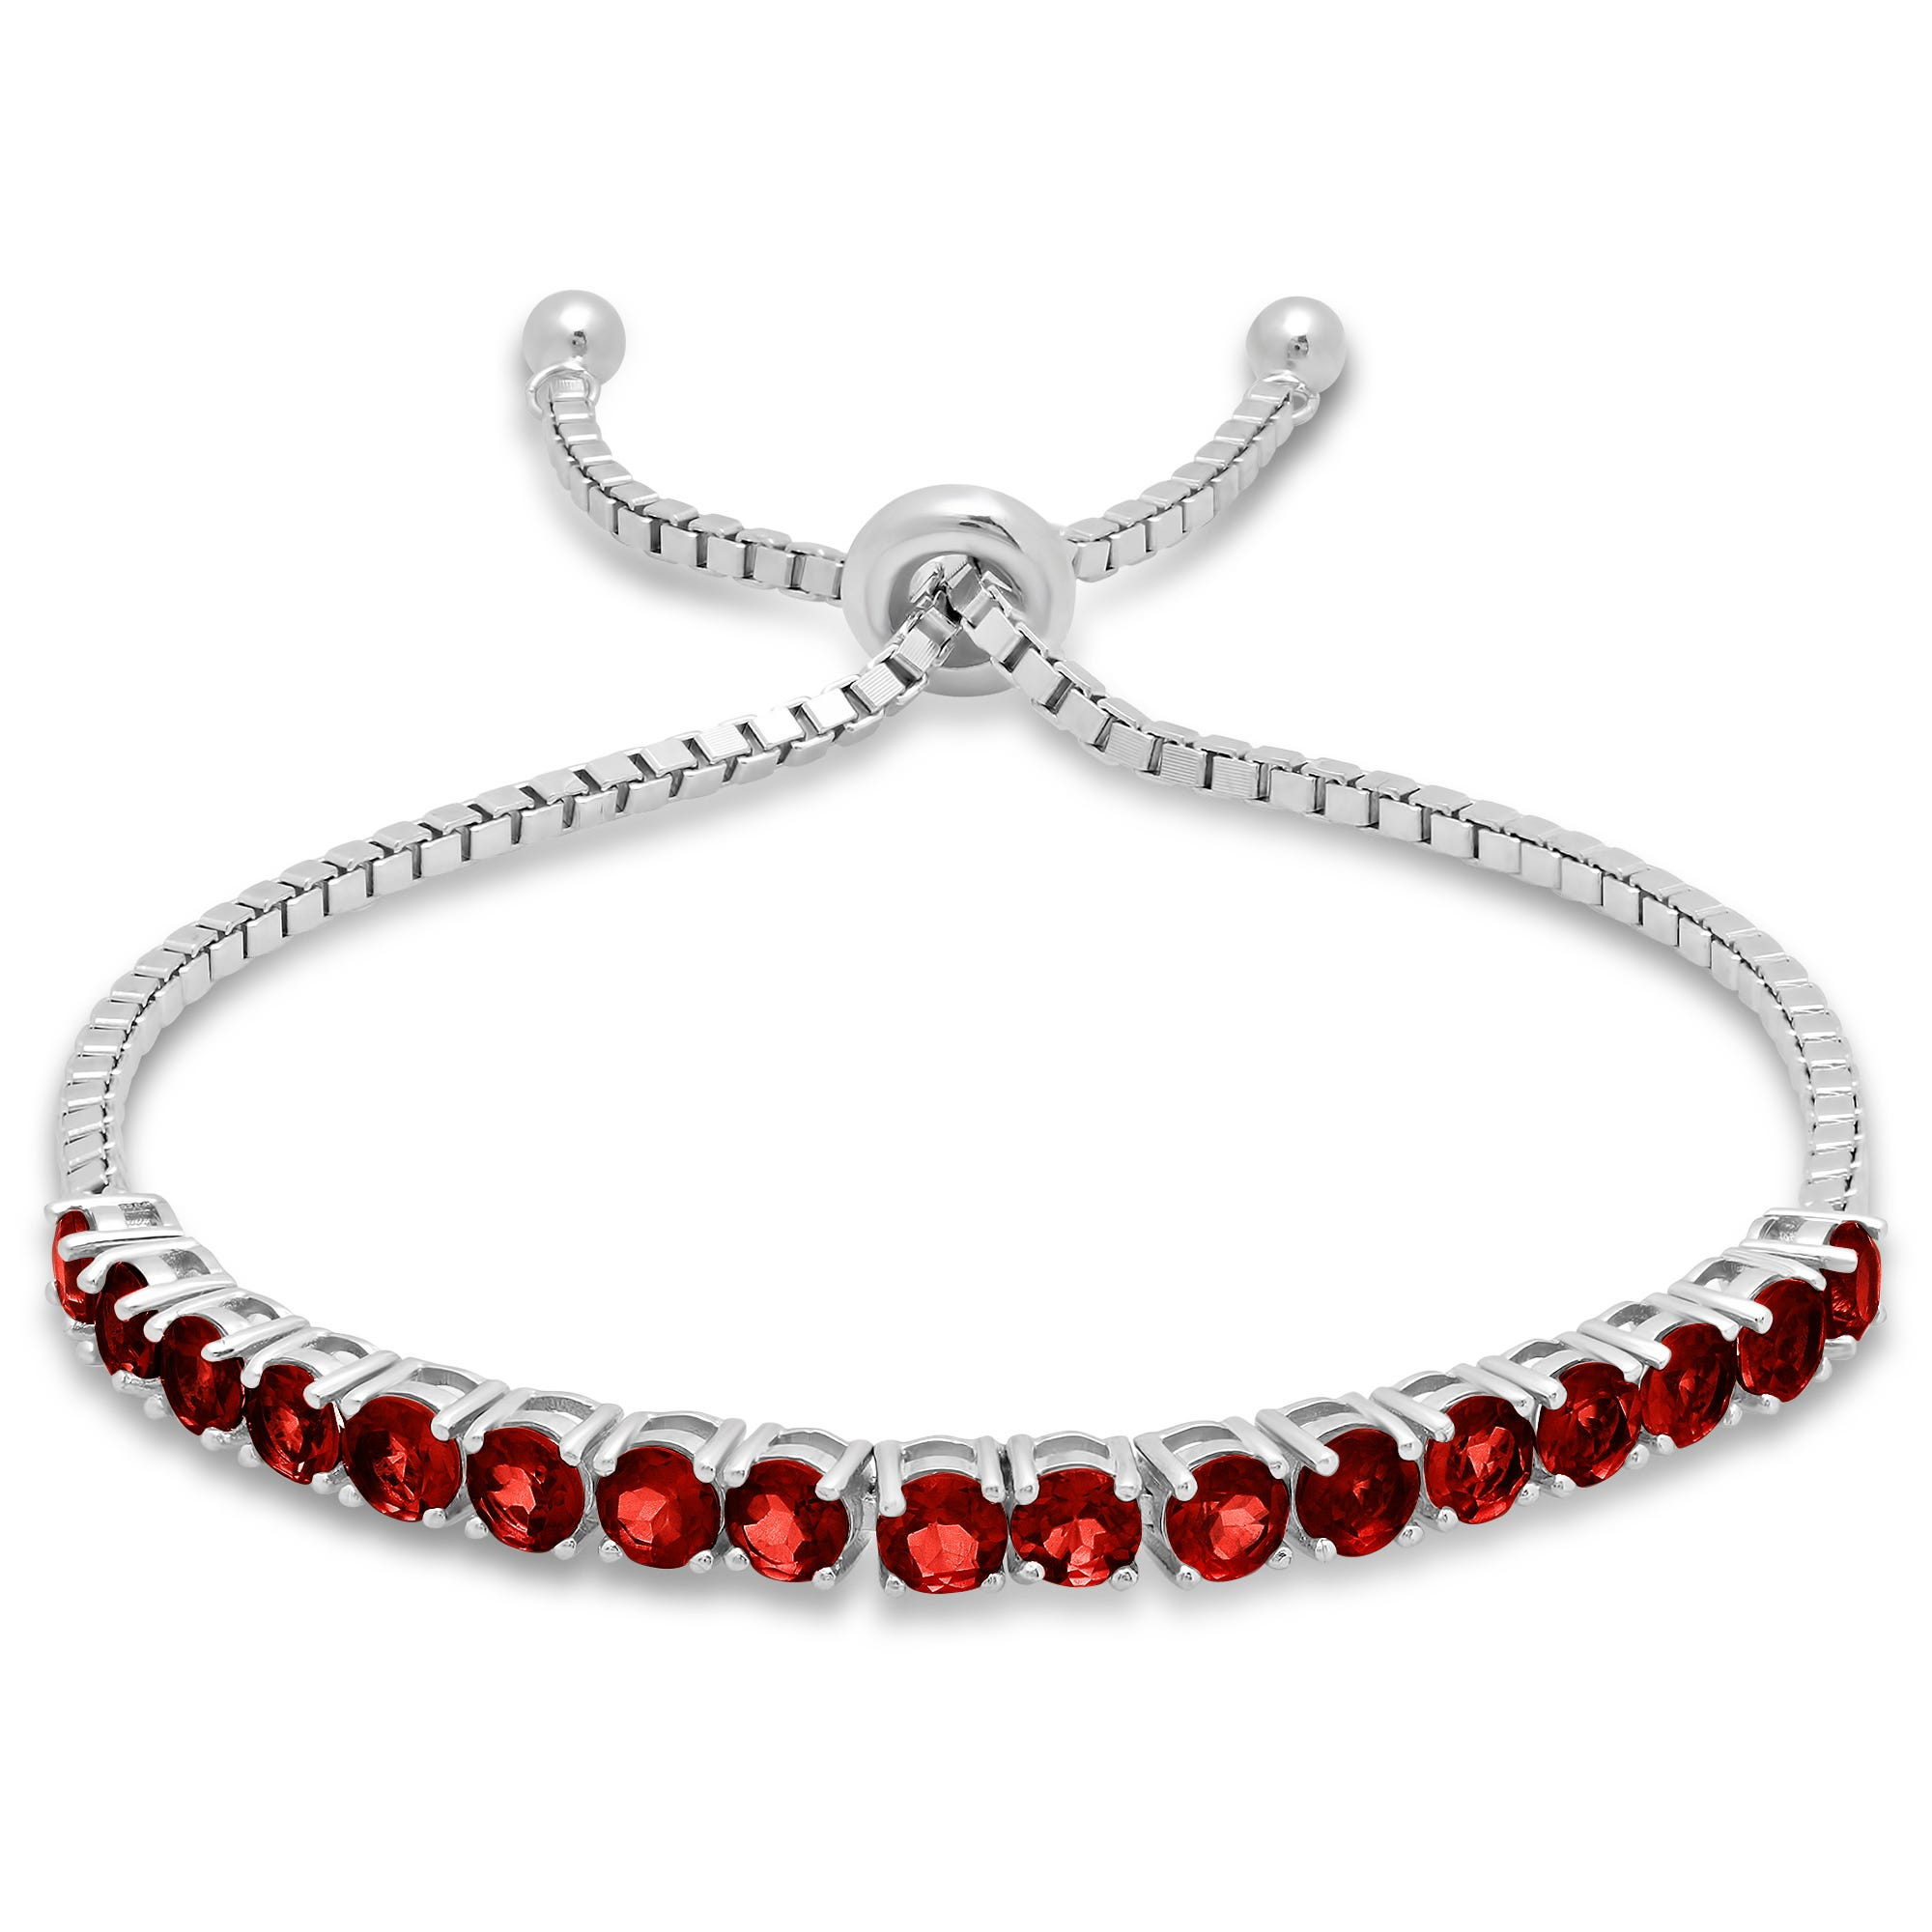 Garnet Adjustable Bolo Bracelet in Sterling Silver